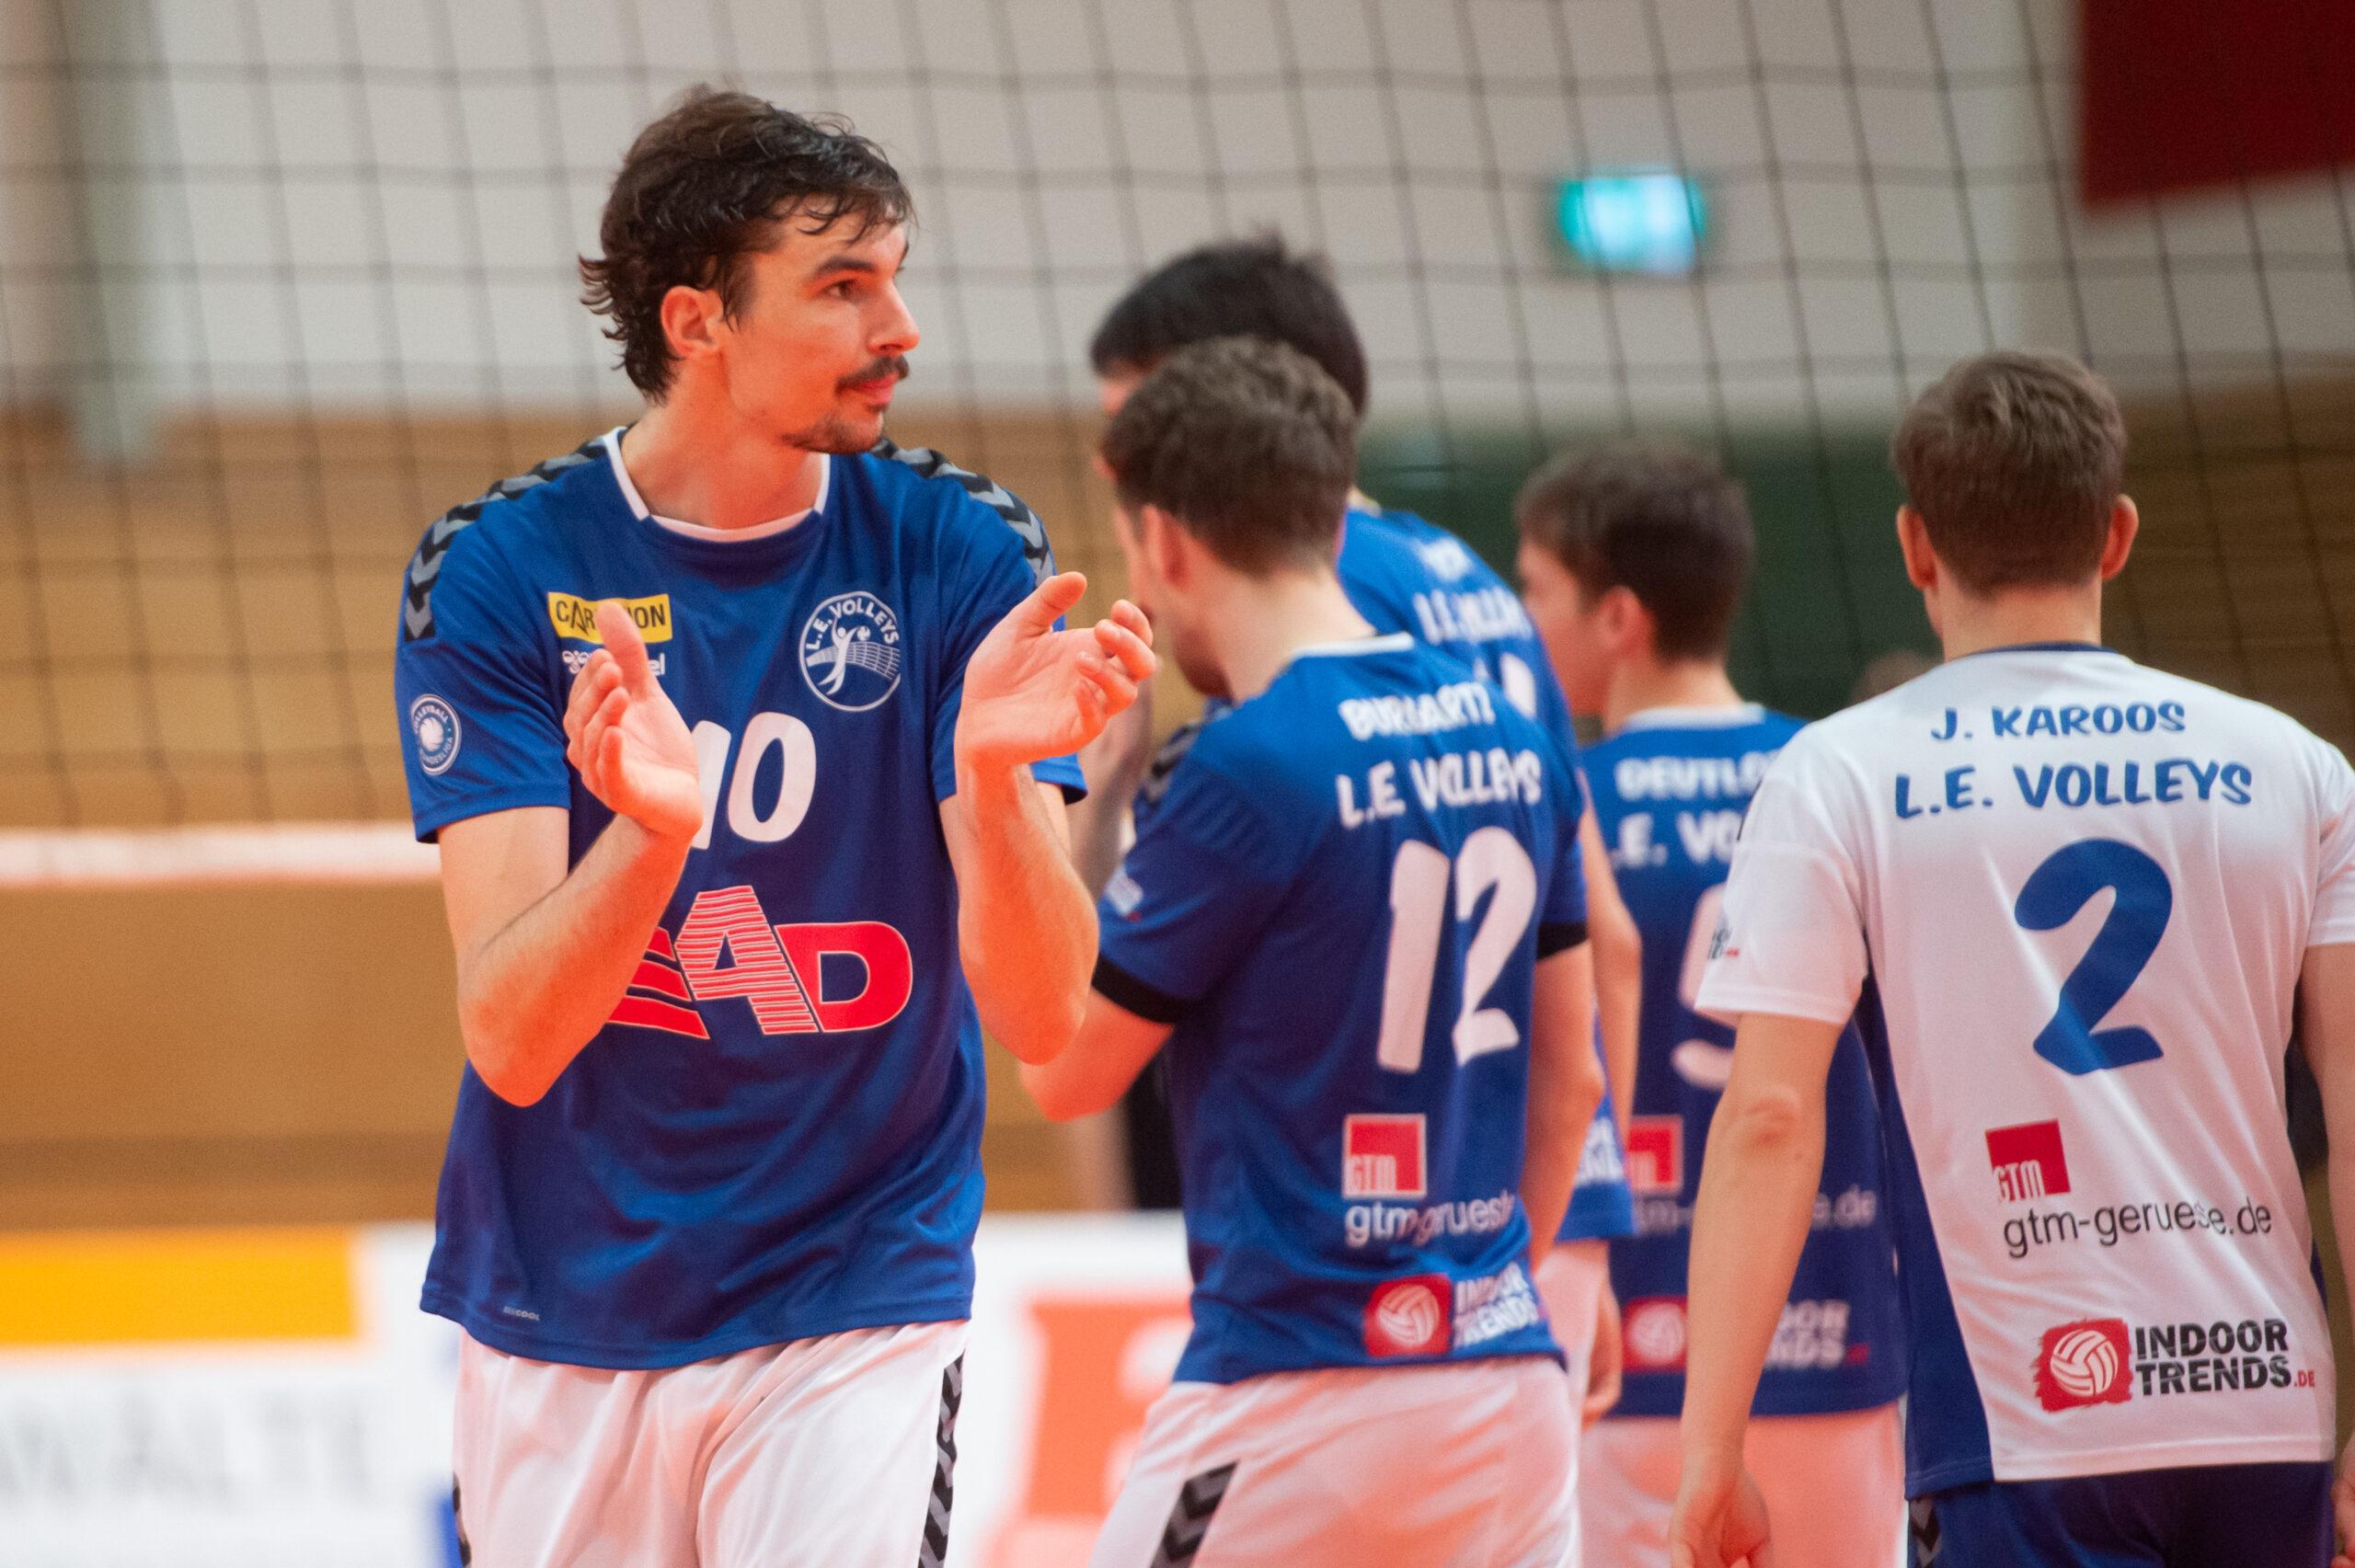 Jannik Kühlborn (Volleys #10)   L.E. Volleys Leipzig vs FT 1844 Freiburg, Volleyball, 2.Liga, 13.03.2021